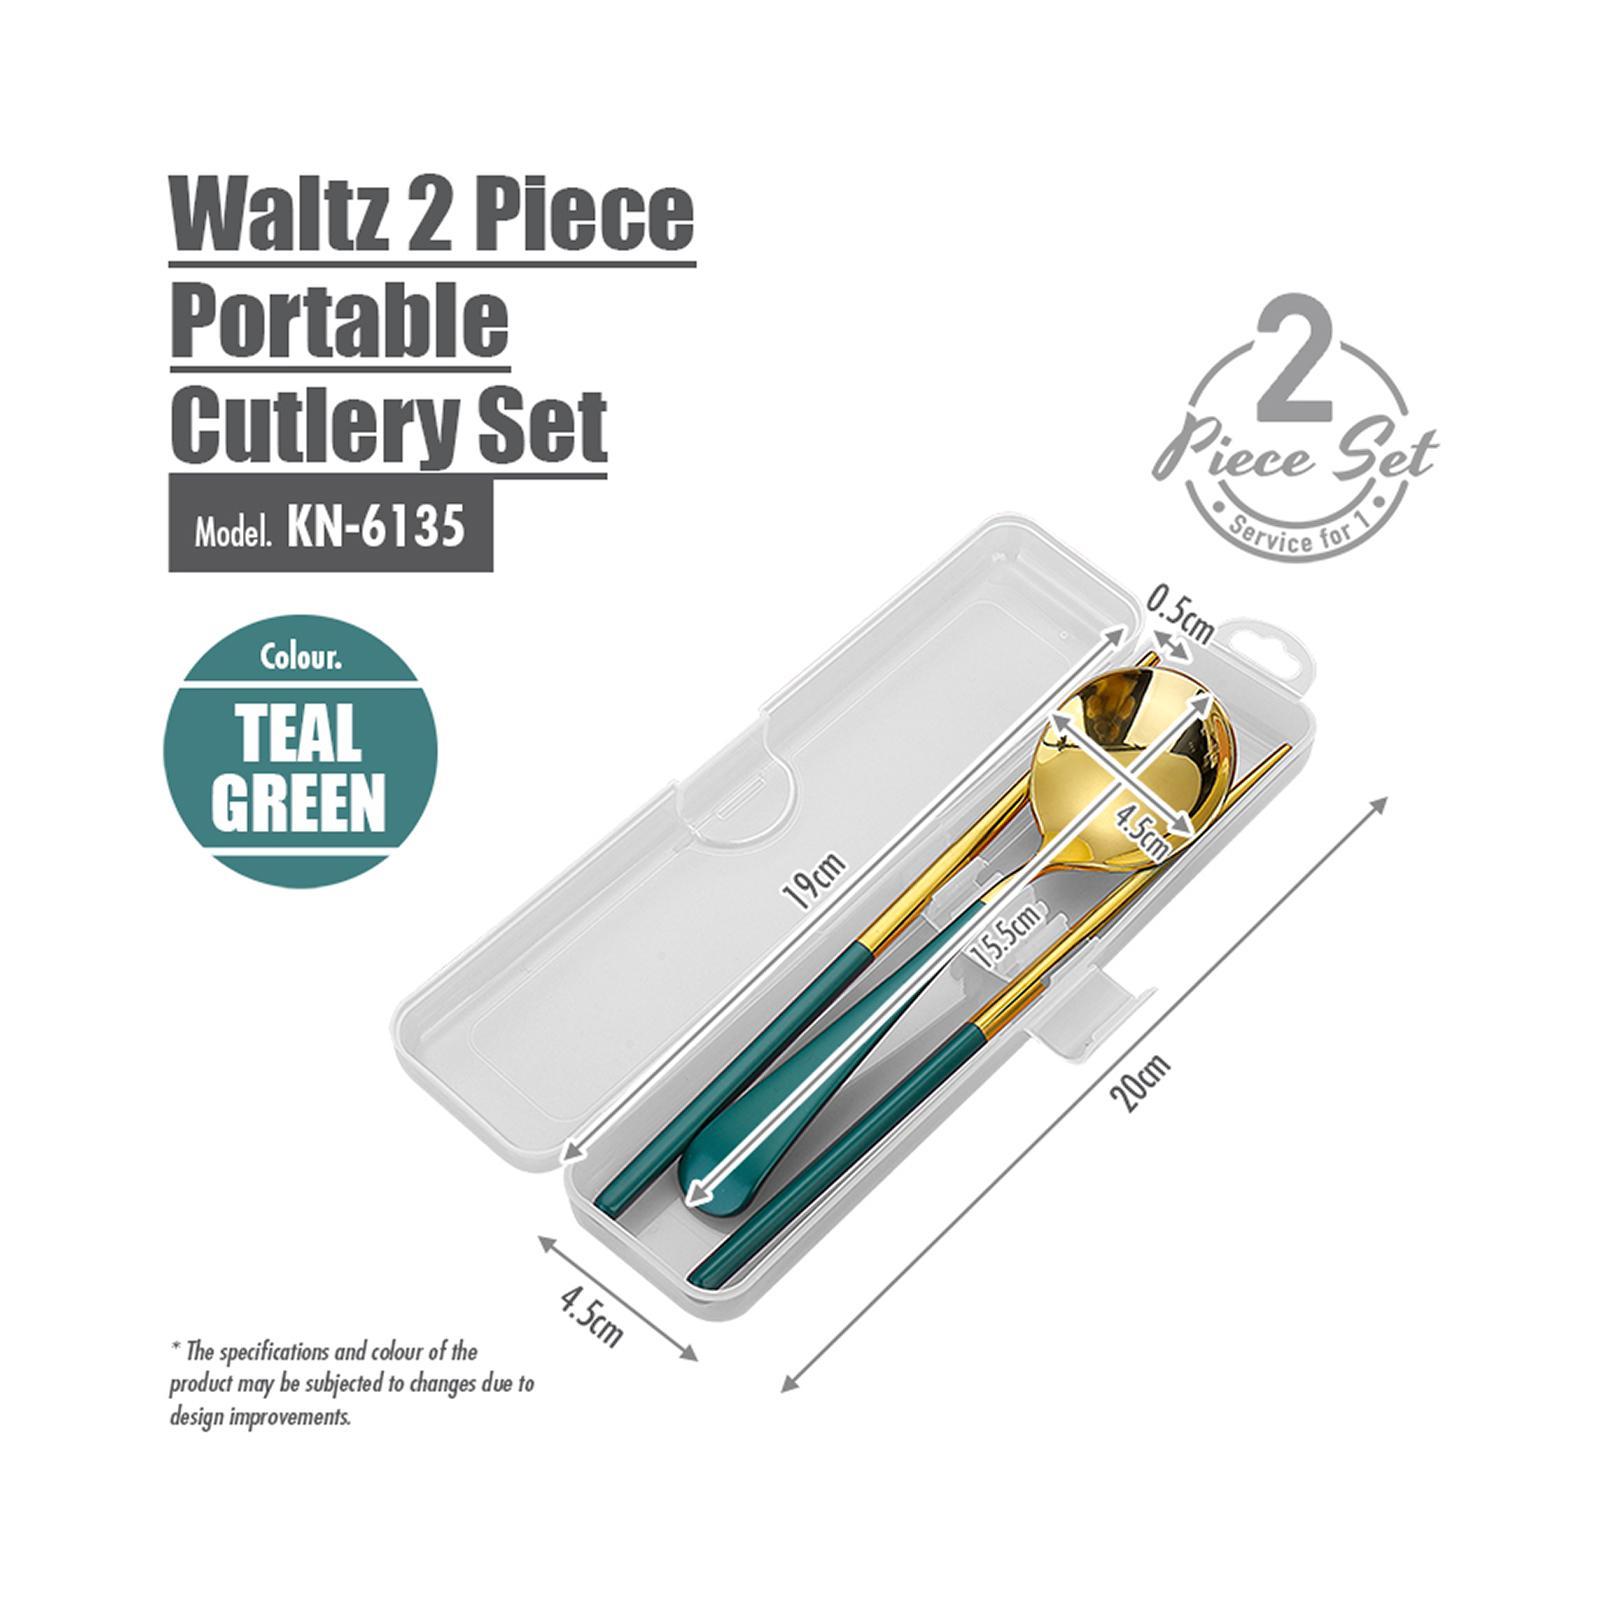 HOUZE Waltz 2 Piece Portable Cutlery Set - Gold